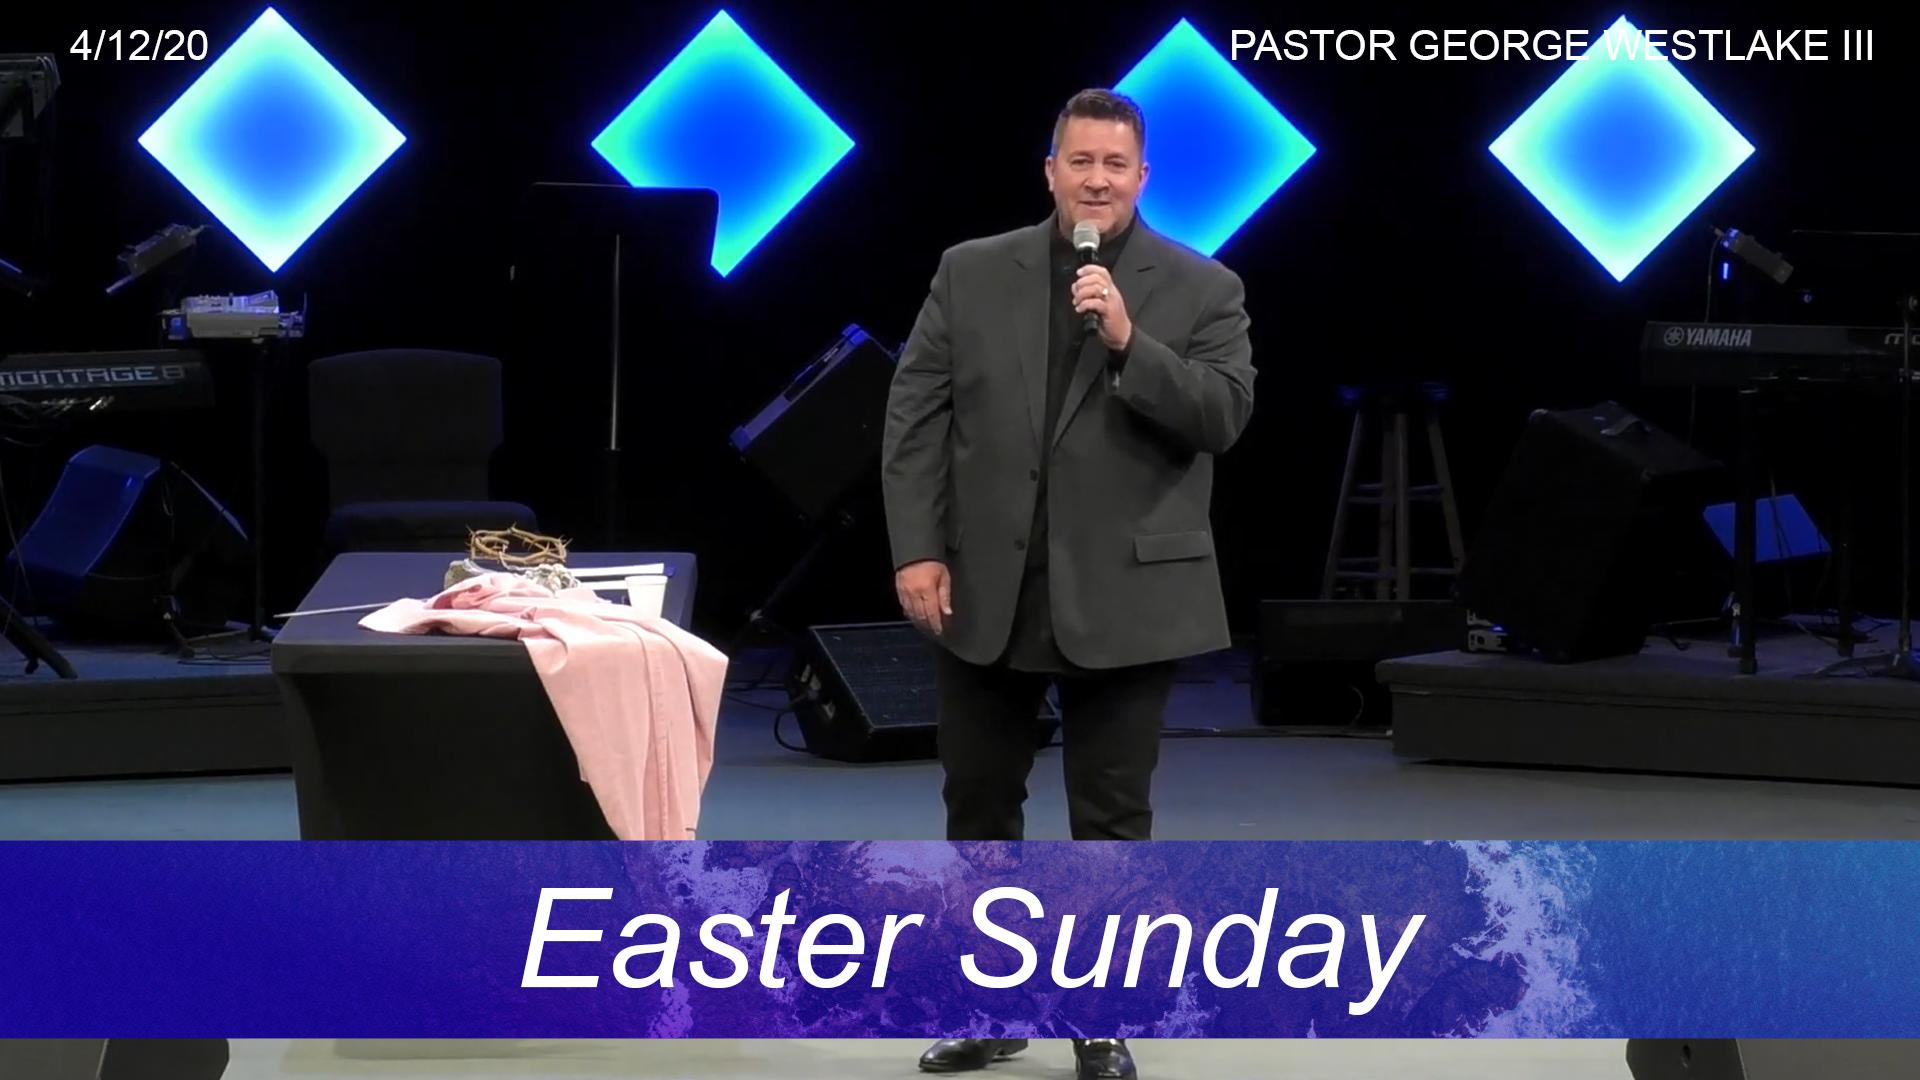 4/12/20 | Easter Sunday